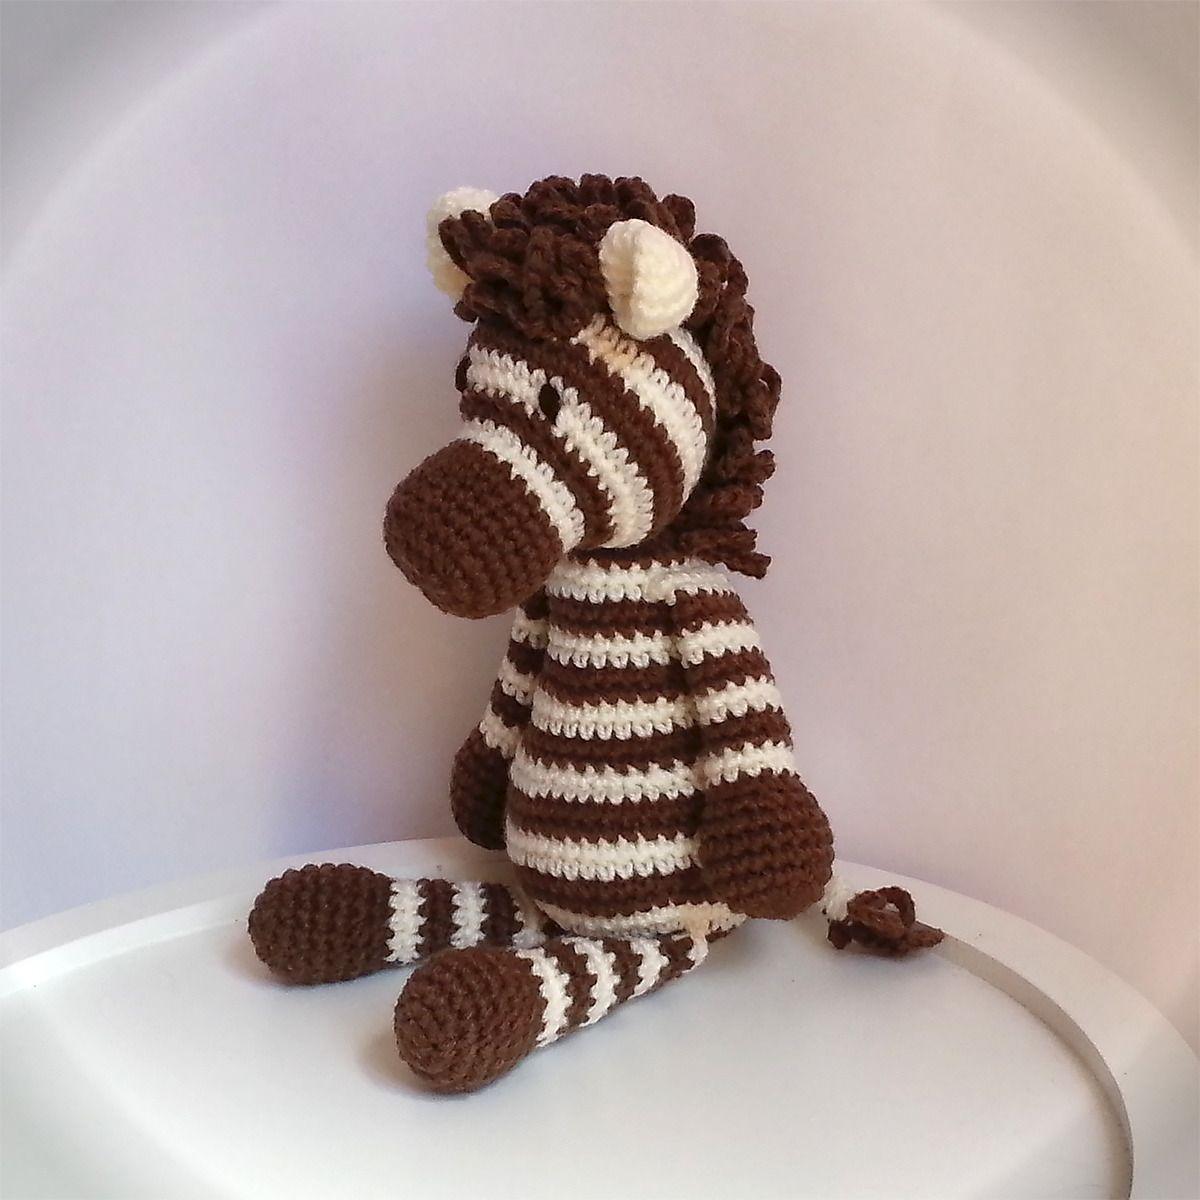 Doudou zbre au crochet animal savane cuddly toy zebra amigurumi doudou zbre au crochet animal savane cuddly toy zebra amigurumi jungle dt1010fo